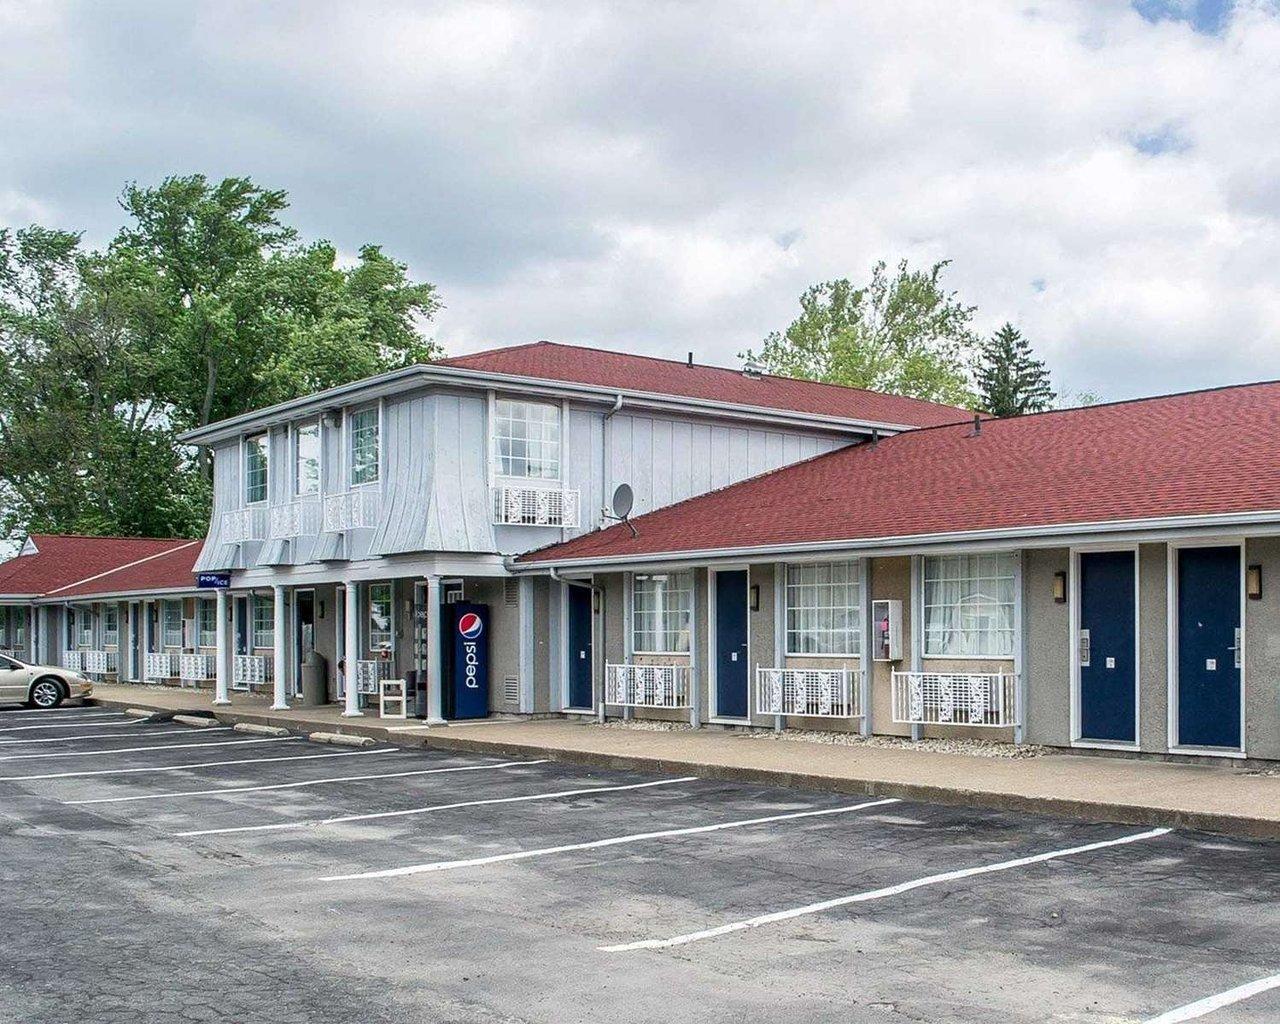 Econo Lodge Inn Suites South 49 7 0 Updated 2018 Prices Motel Reviews Sandusky Ohio Tripadvisor